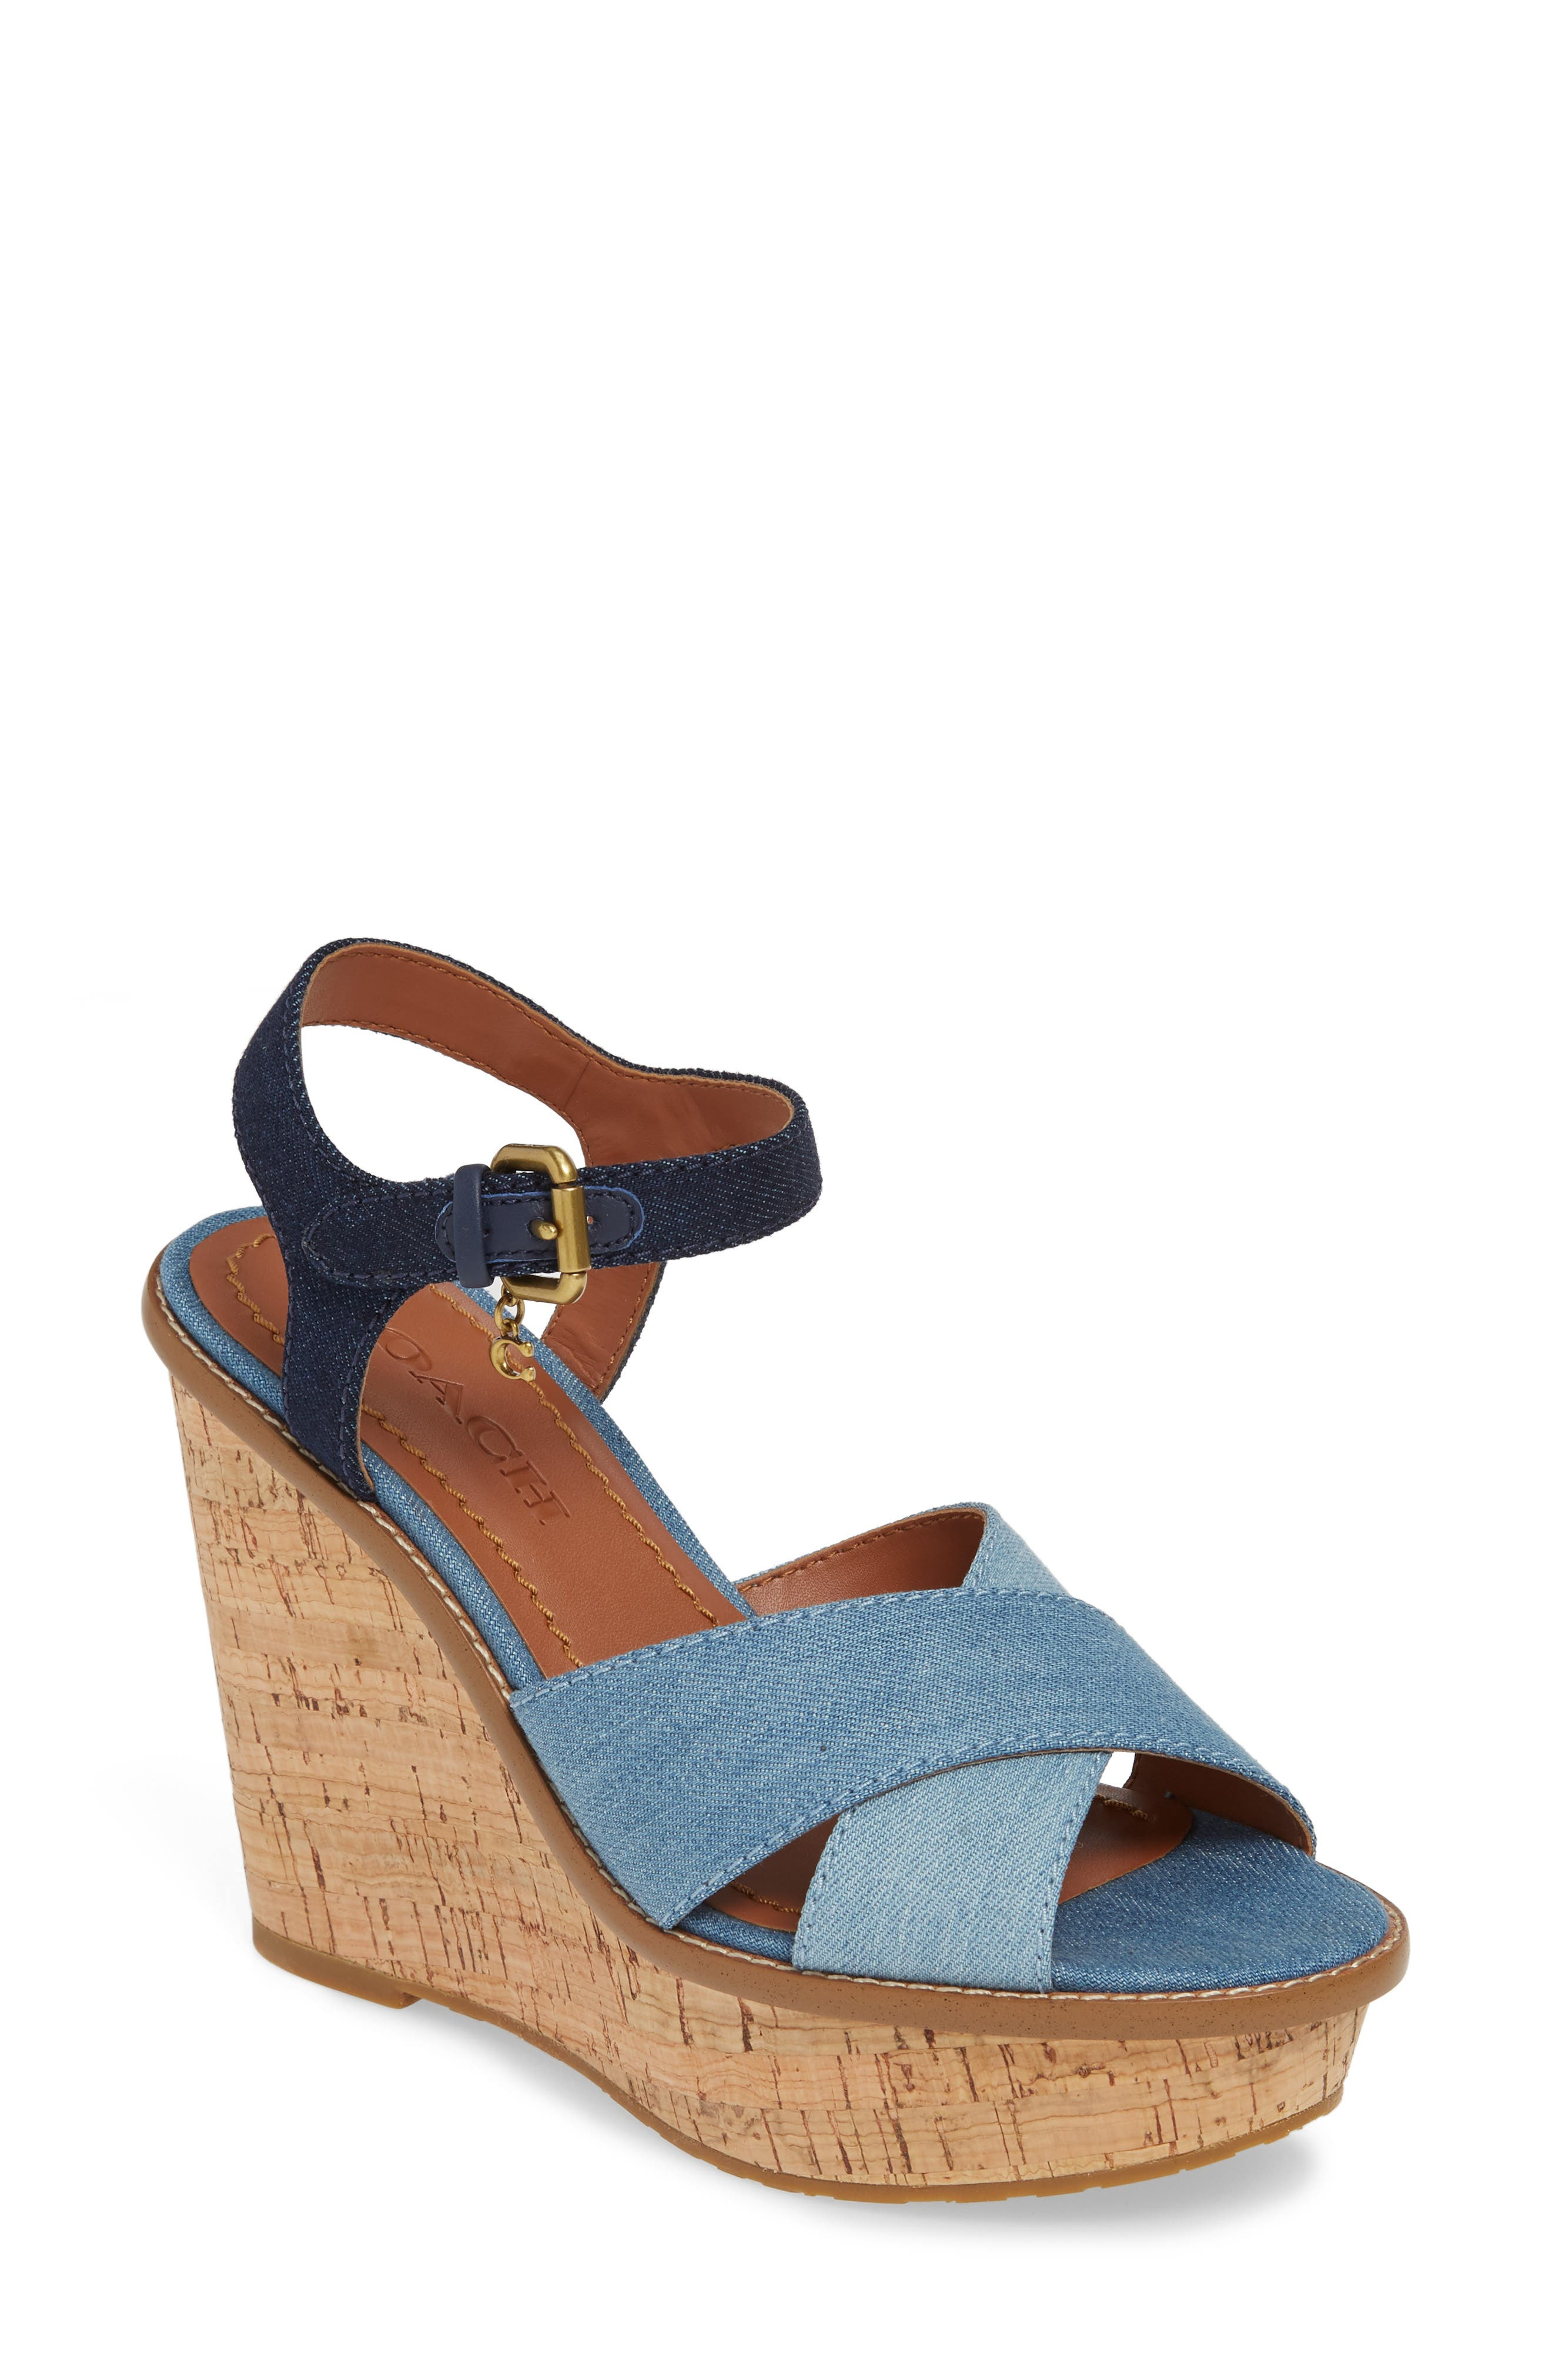 2b717b6958b2 Women s COACH Platform Sandals  Wedge